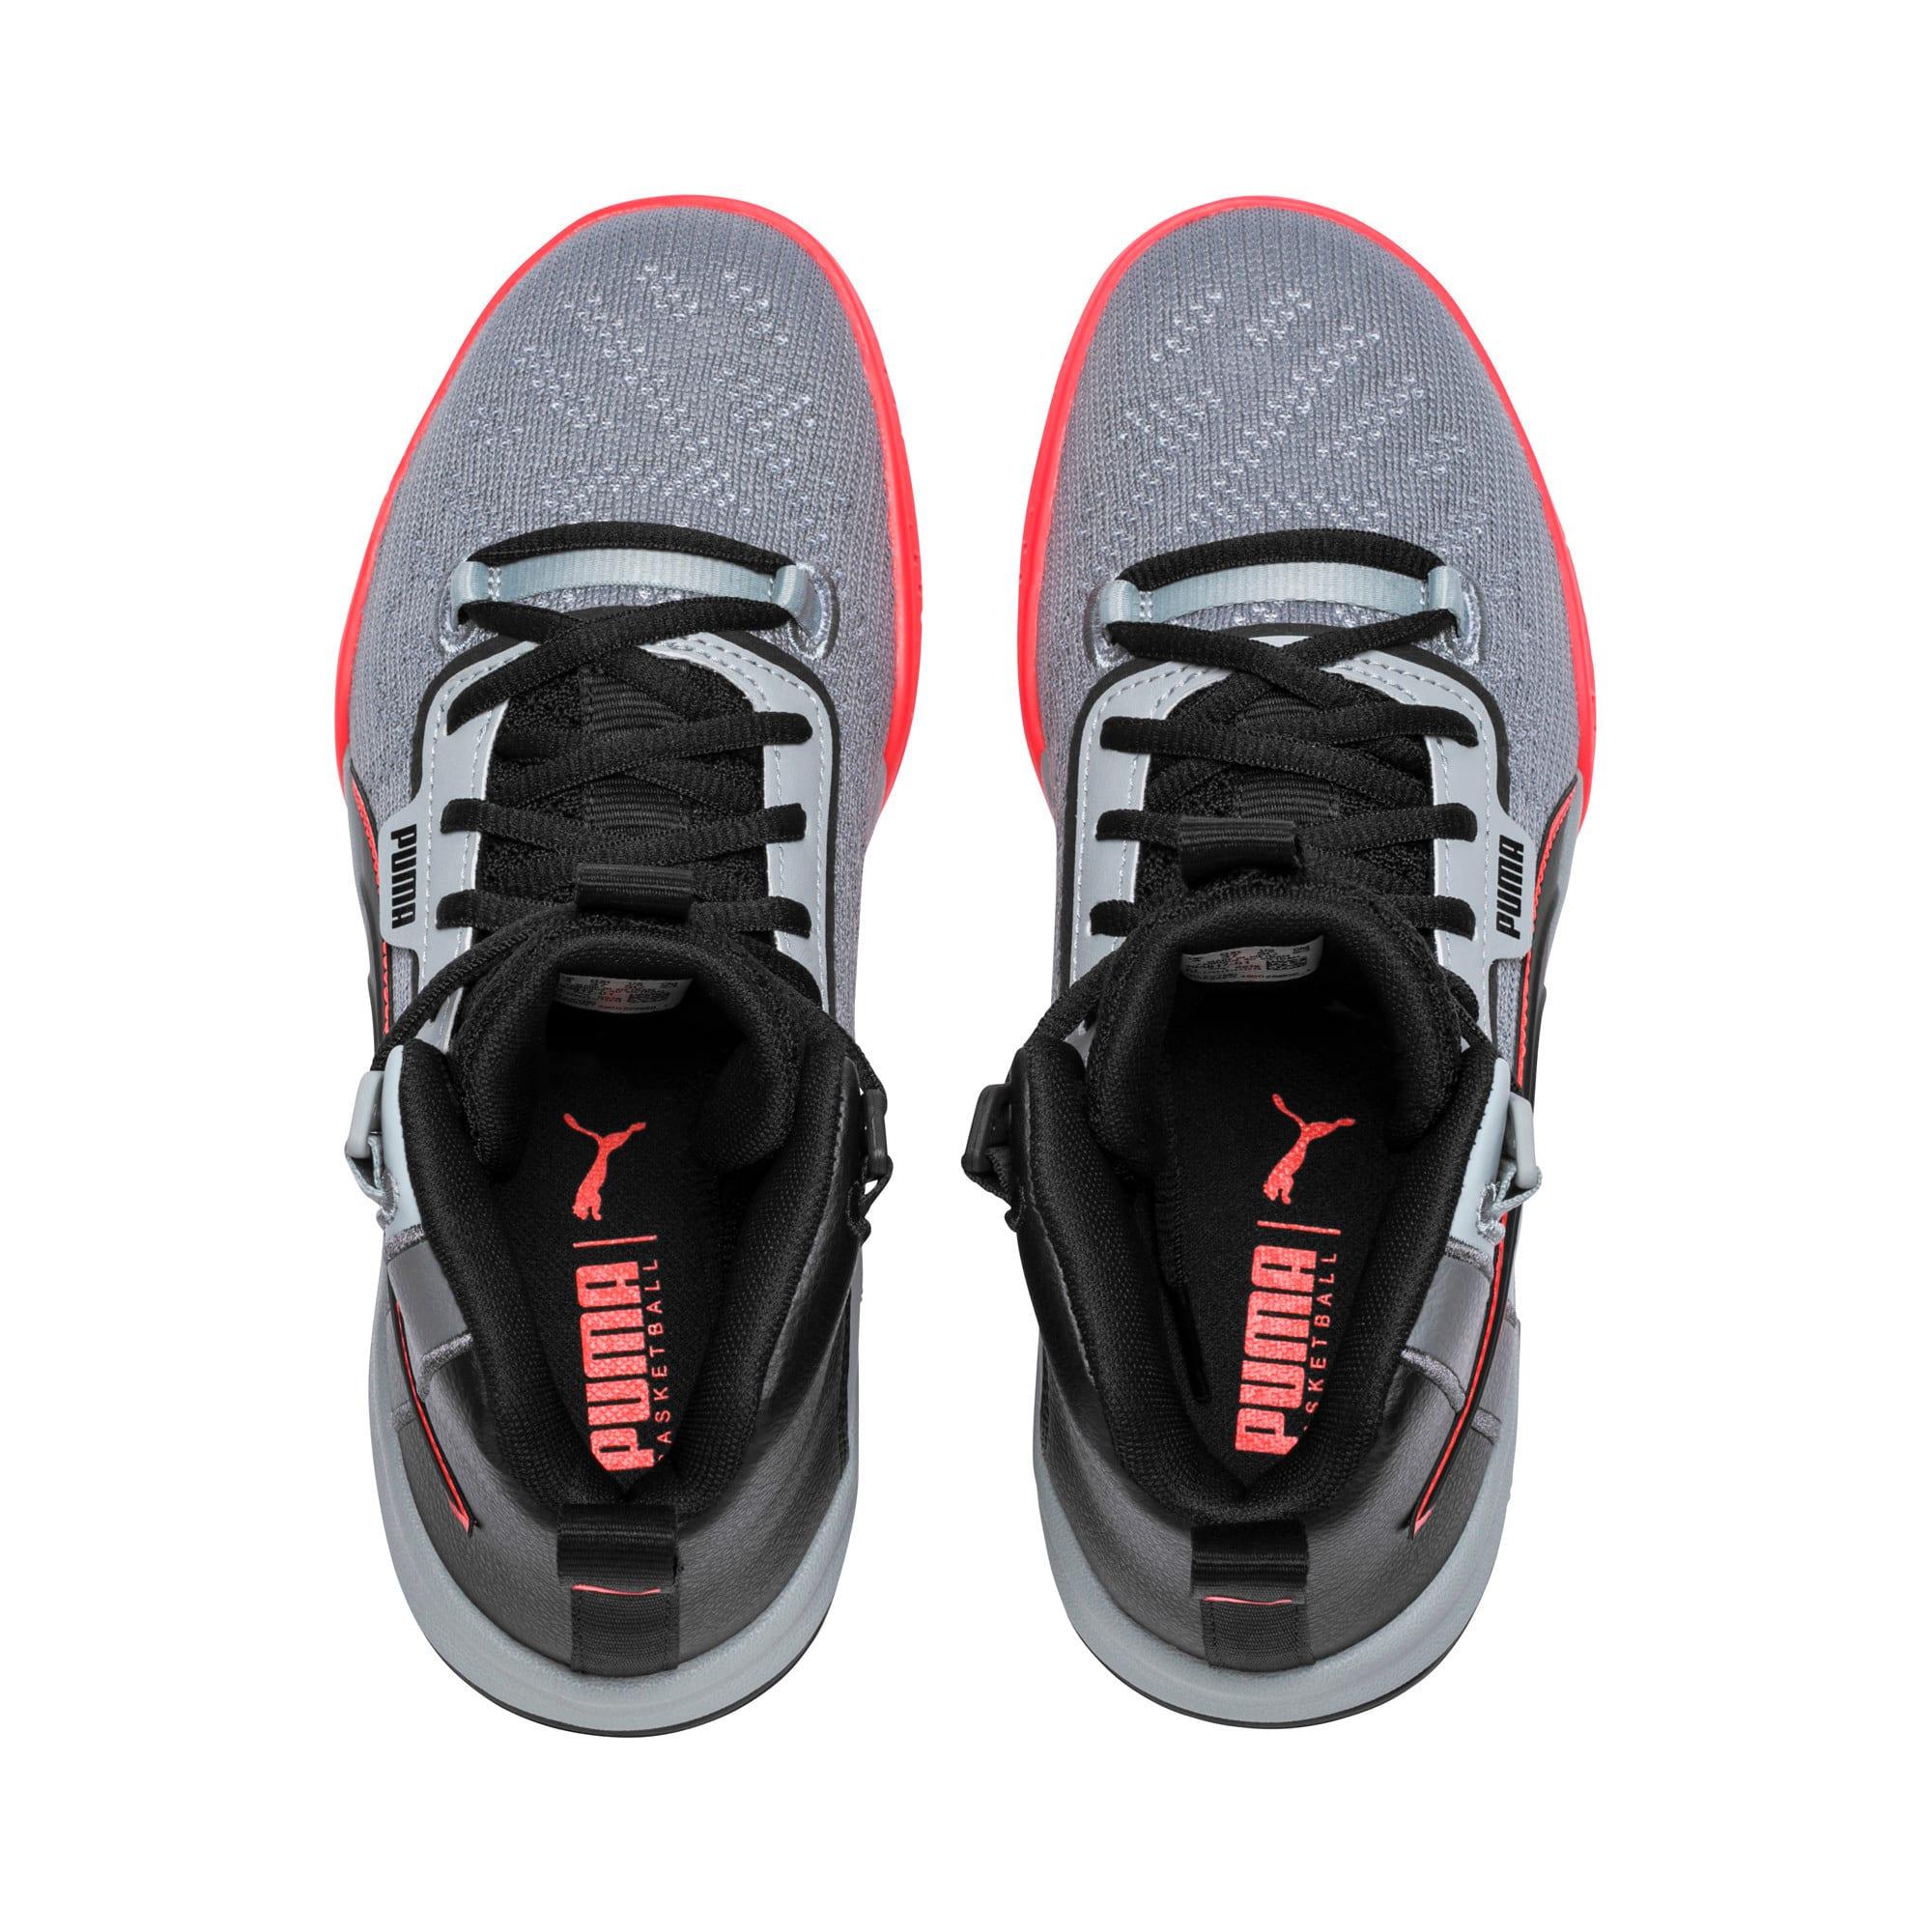 Thumbnail 6 of Legacy Disrupt Basketball Shoes JR, Puma Black-Red Blast, medium